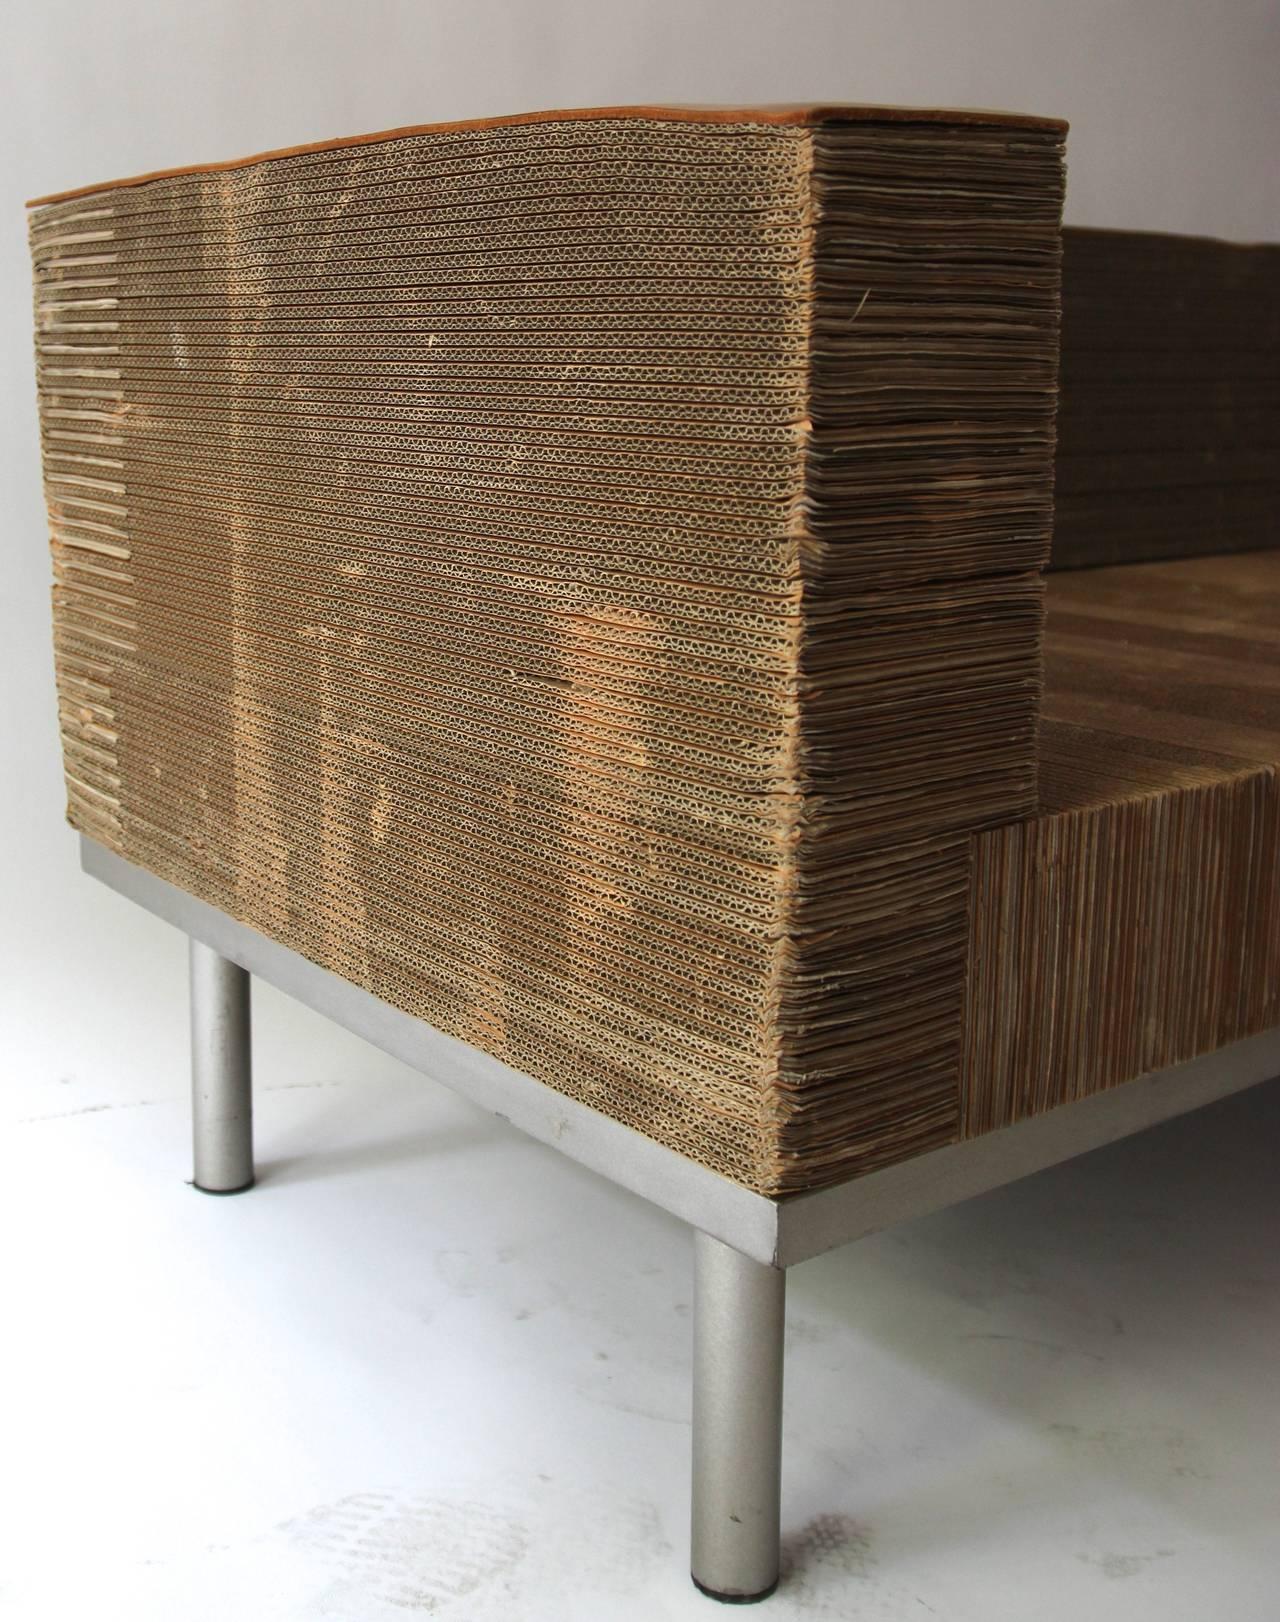 Fernando And Humberto Campana Papel Sofa Cardboard Circa 2000 Italy For Sale At 1stdibs